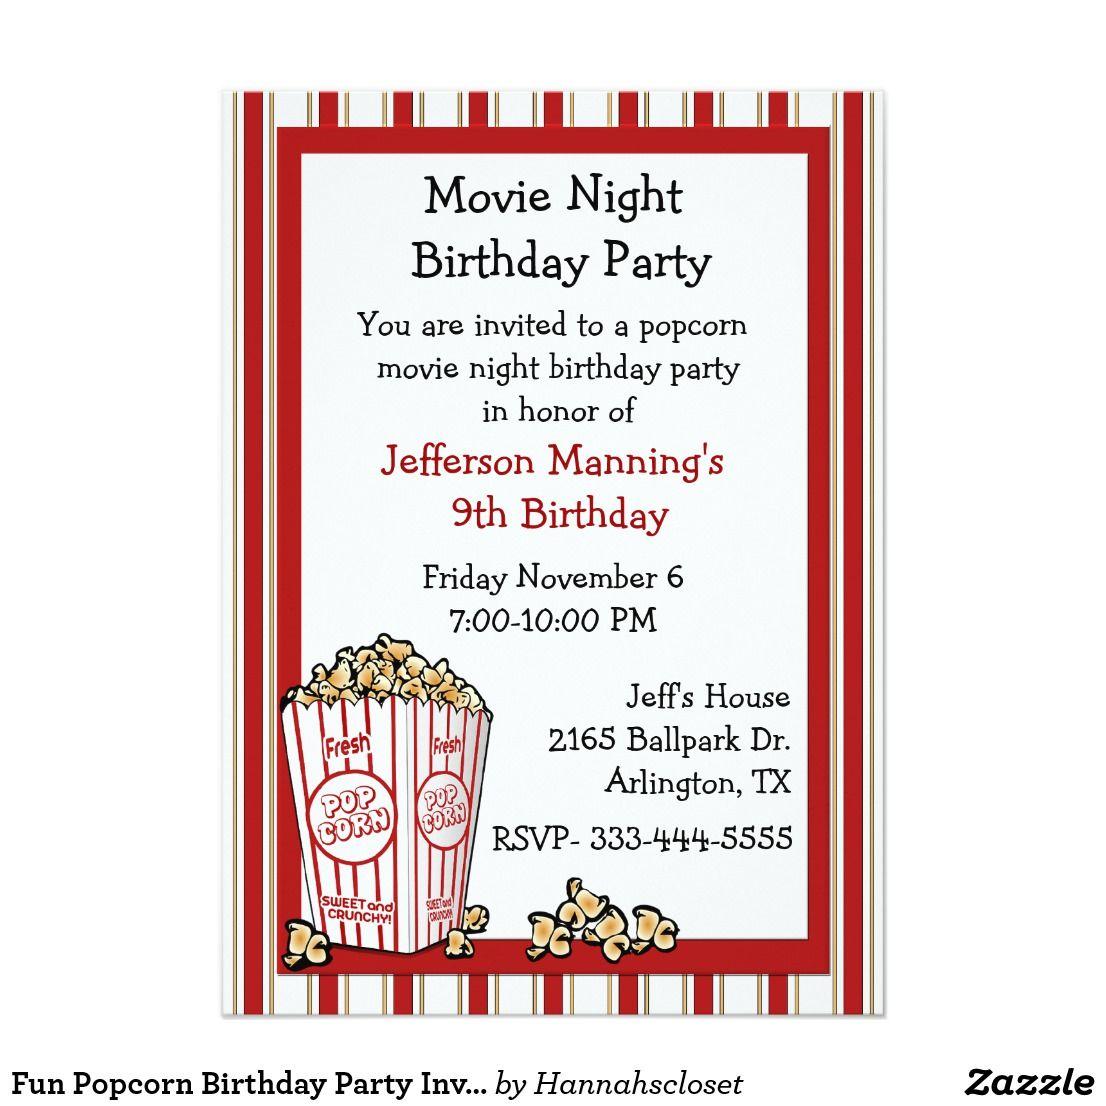 Fun Popcorn Birthday Party Invitation | Take me to the drive-in ...